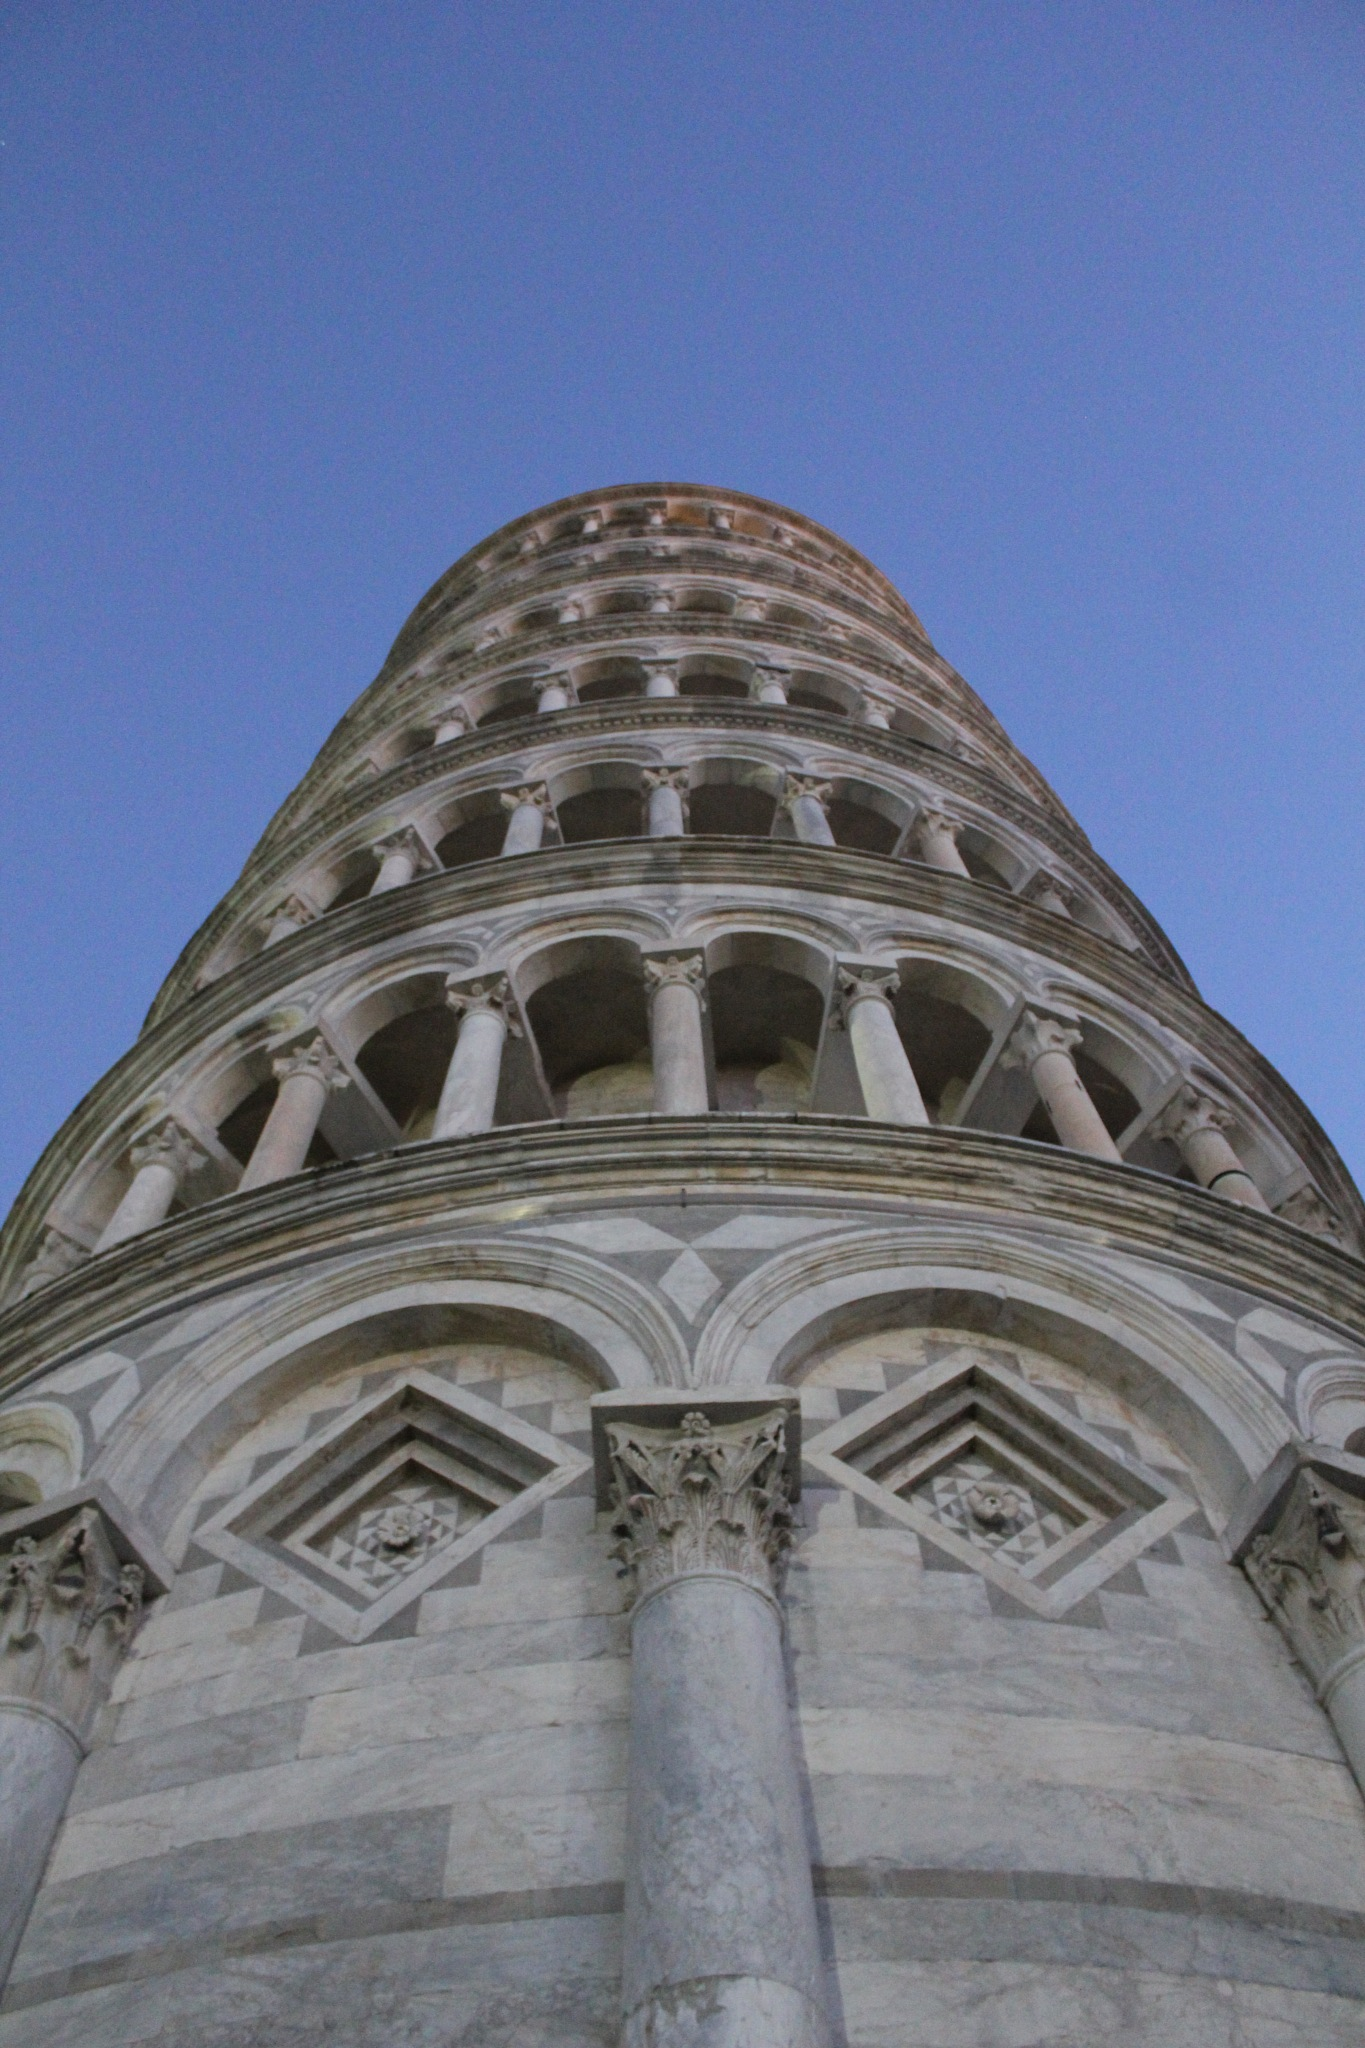 Torre Pendente by colin.savidge